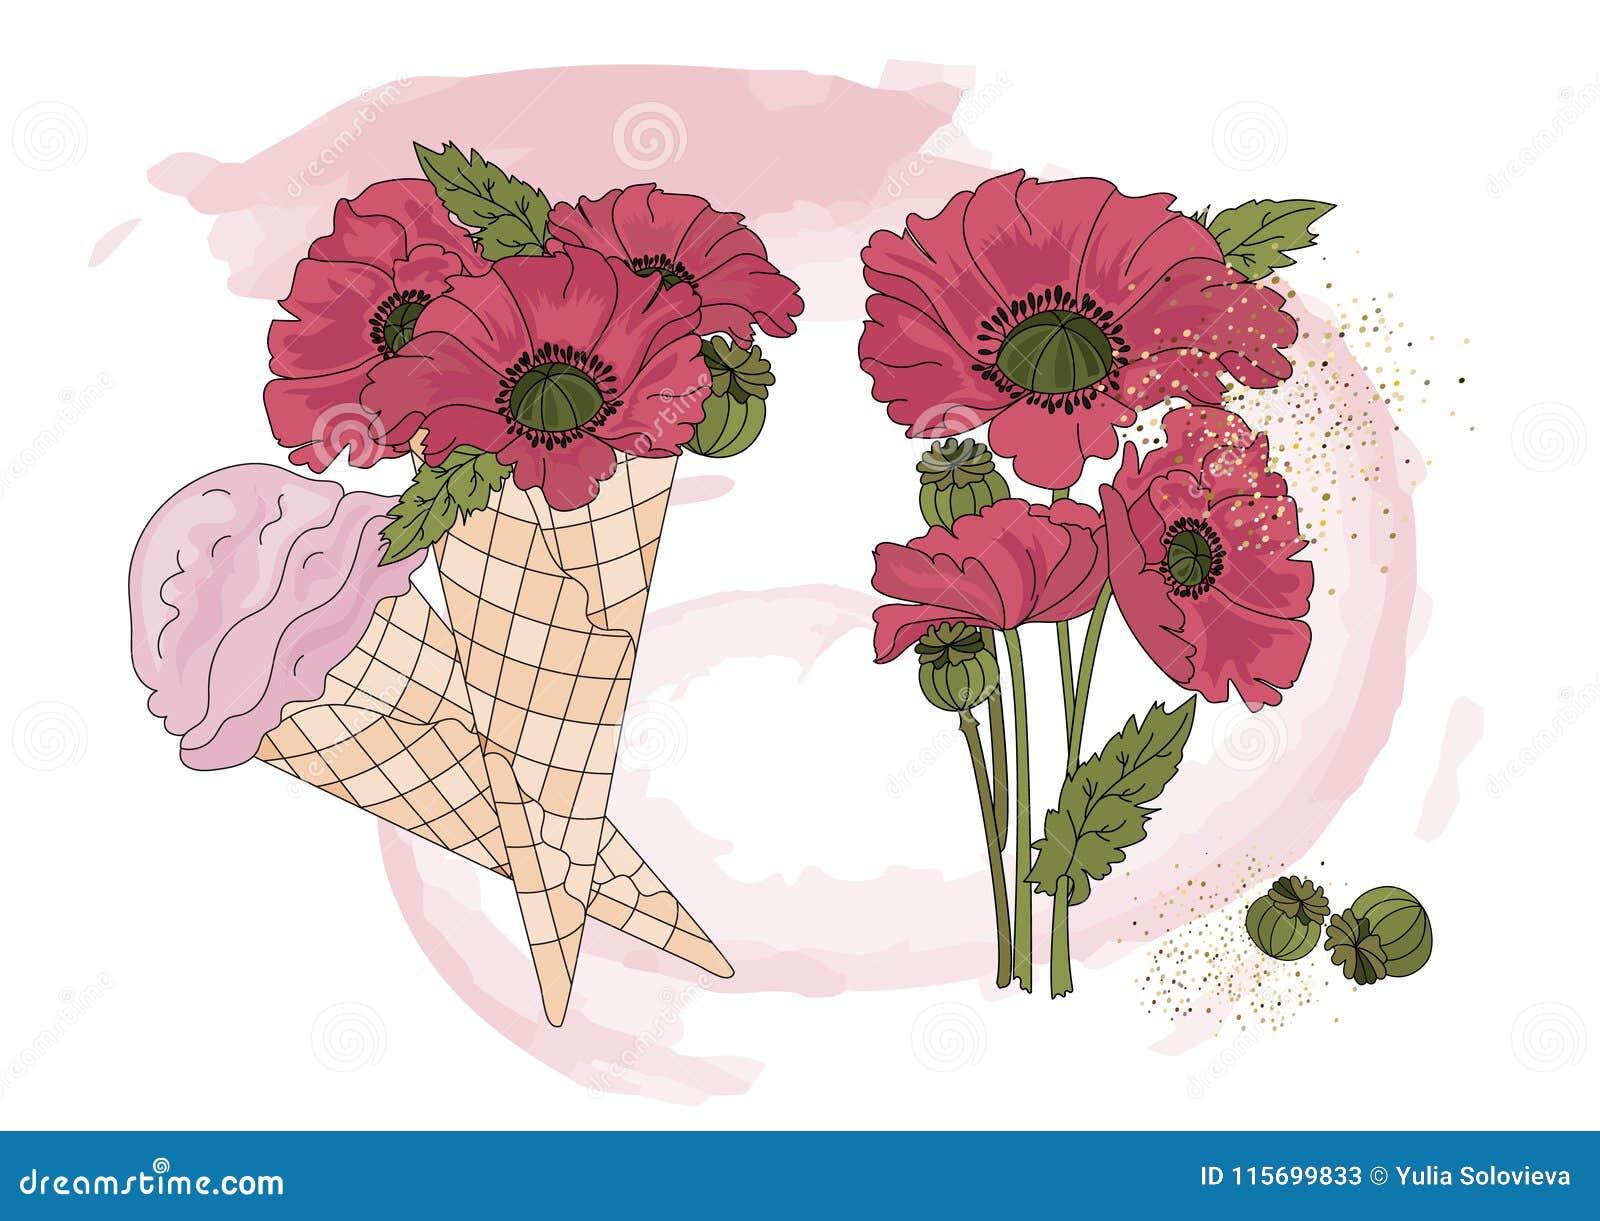 Flower Clipart Poppy Ice Cream Color Vector Illustration Set Cartoon